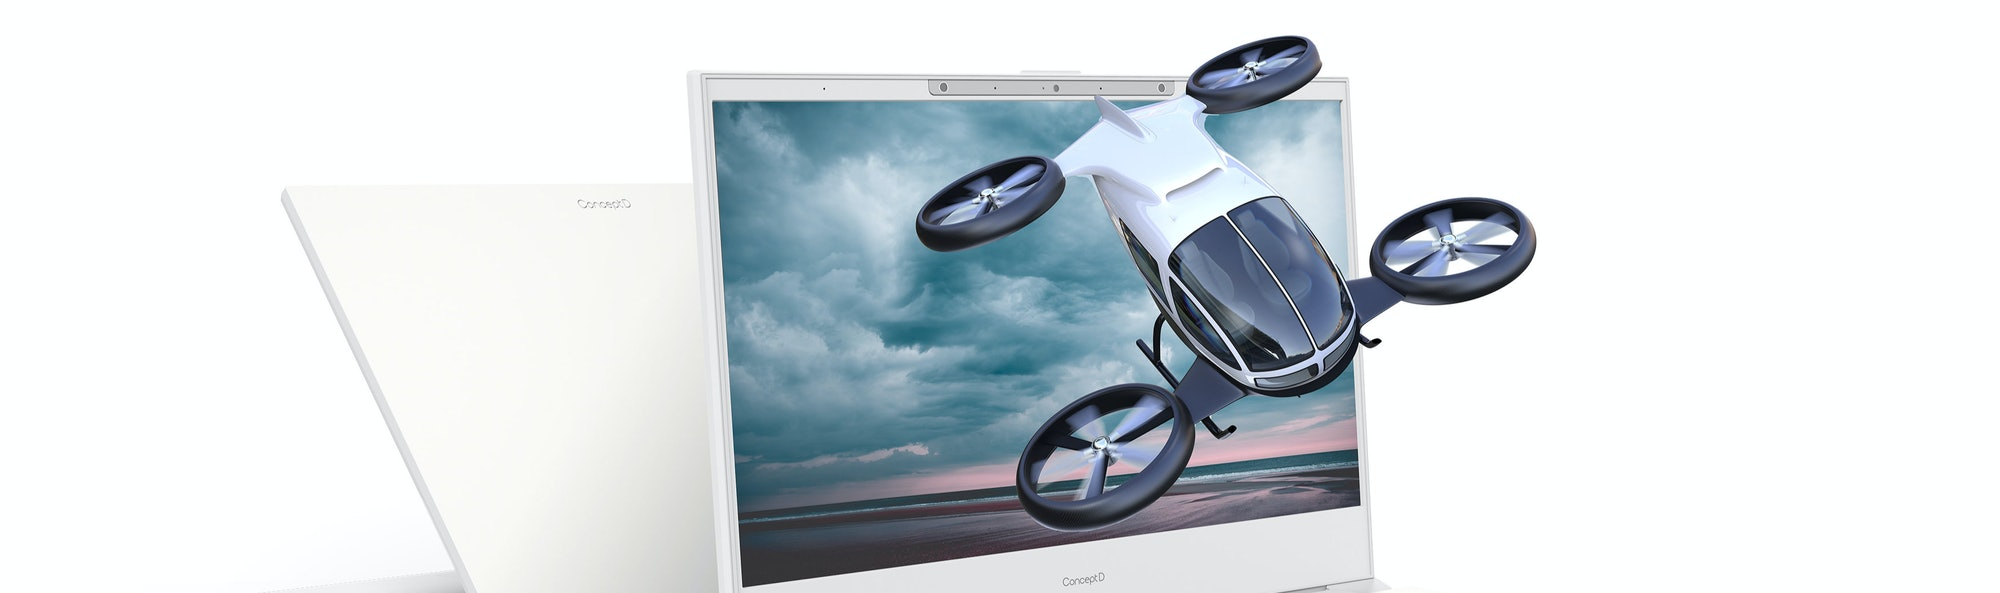 Acer ConceptD 7 3D Spatial labs edition laptop